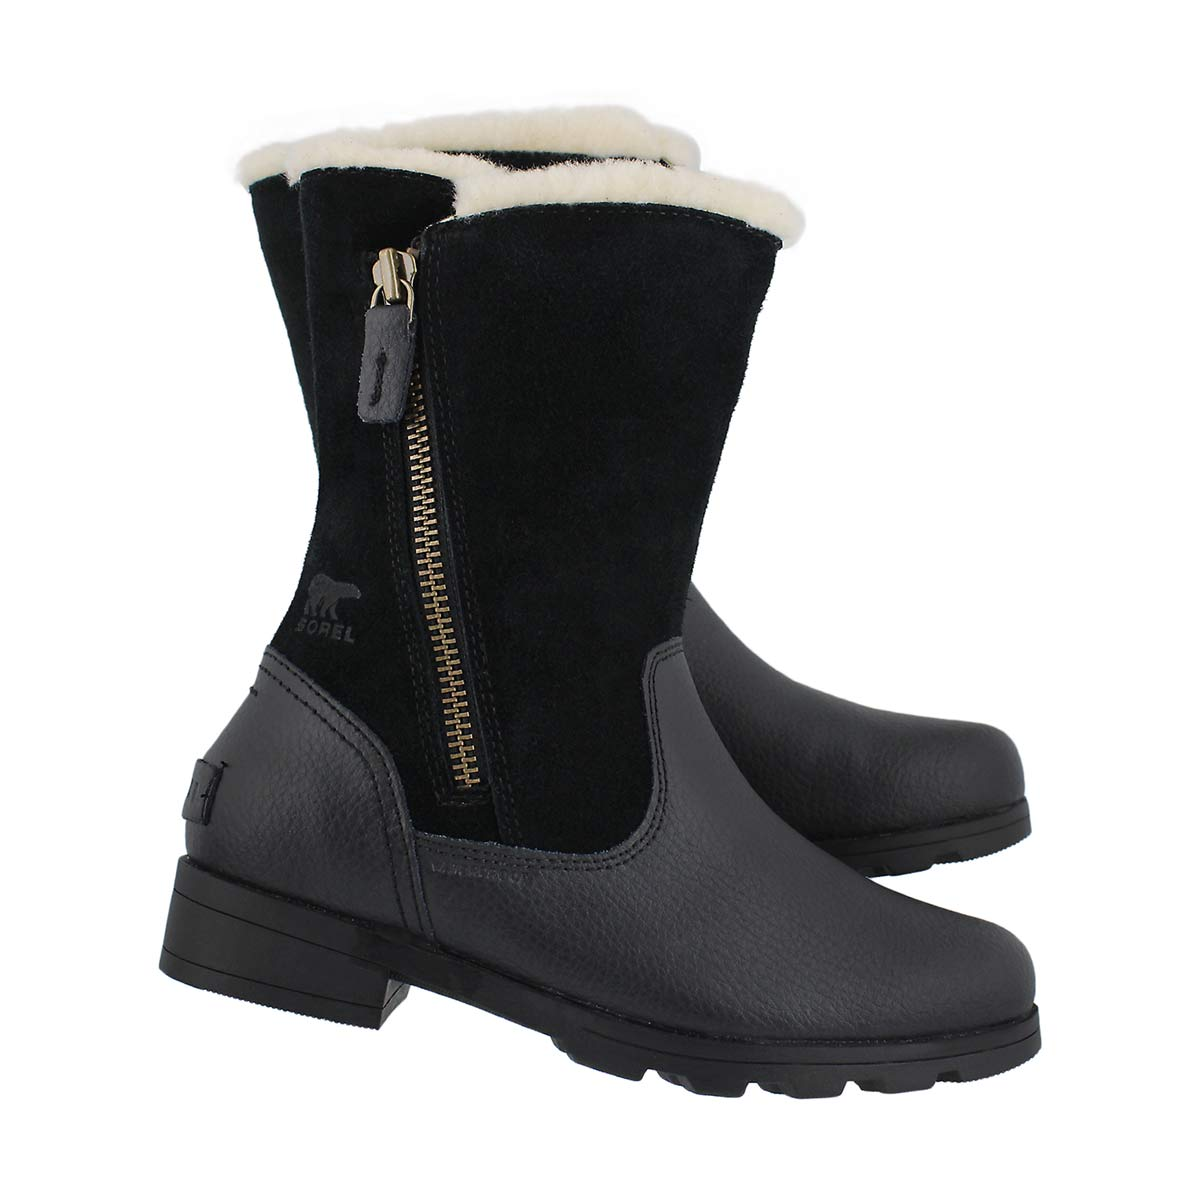 Grls Emelie Foldover black casual boot